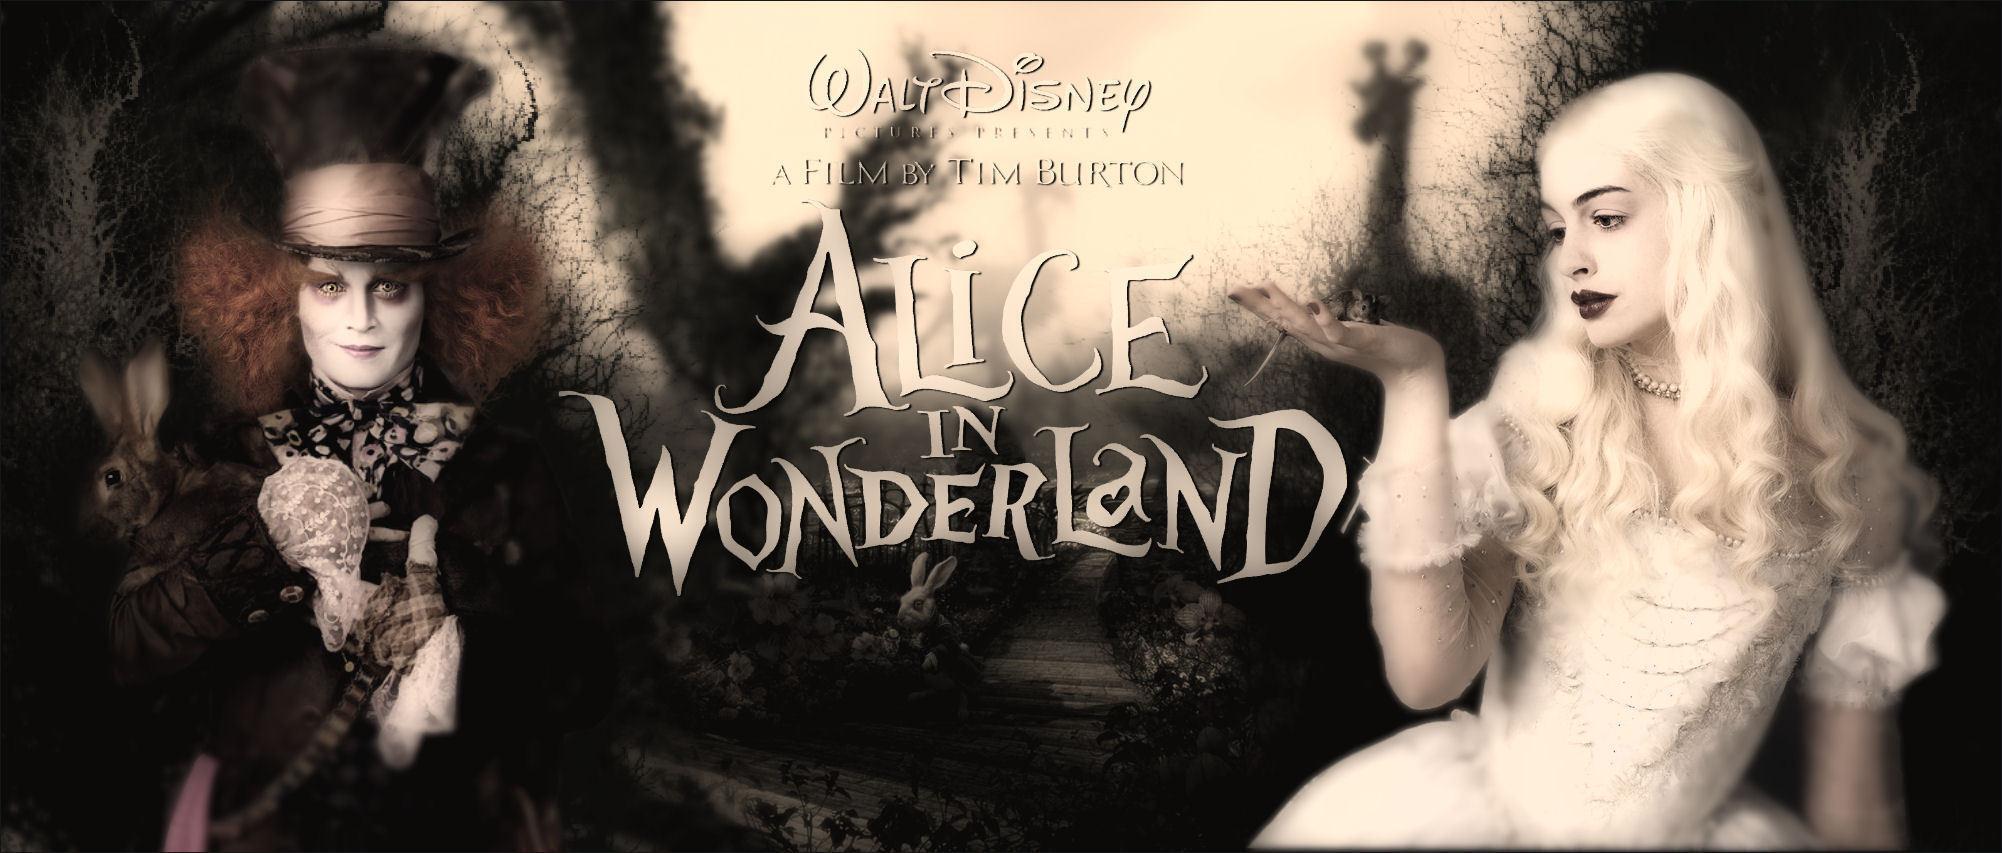 Alice wonderland movie 2010